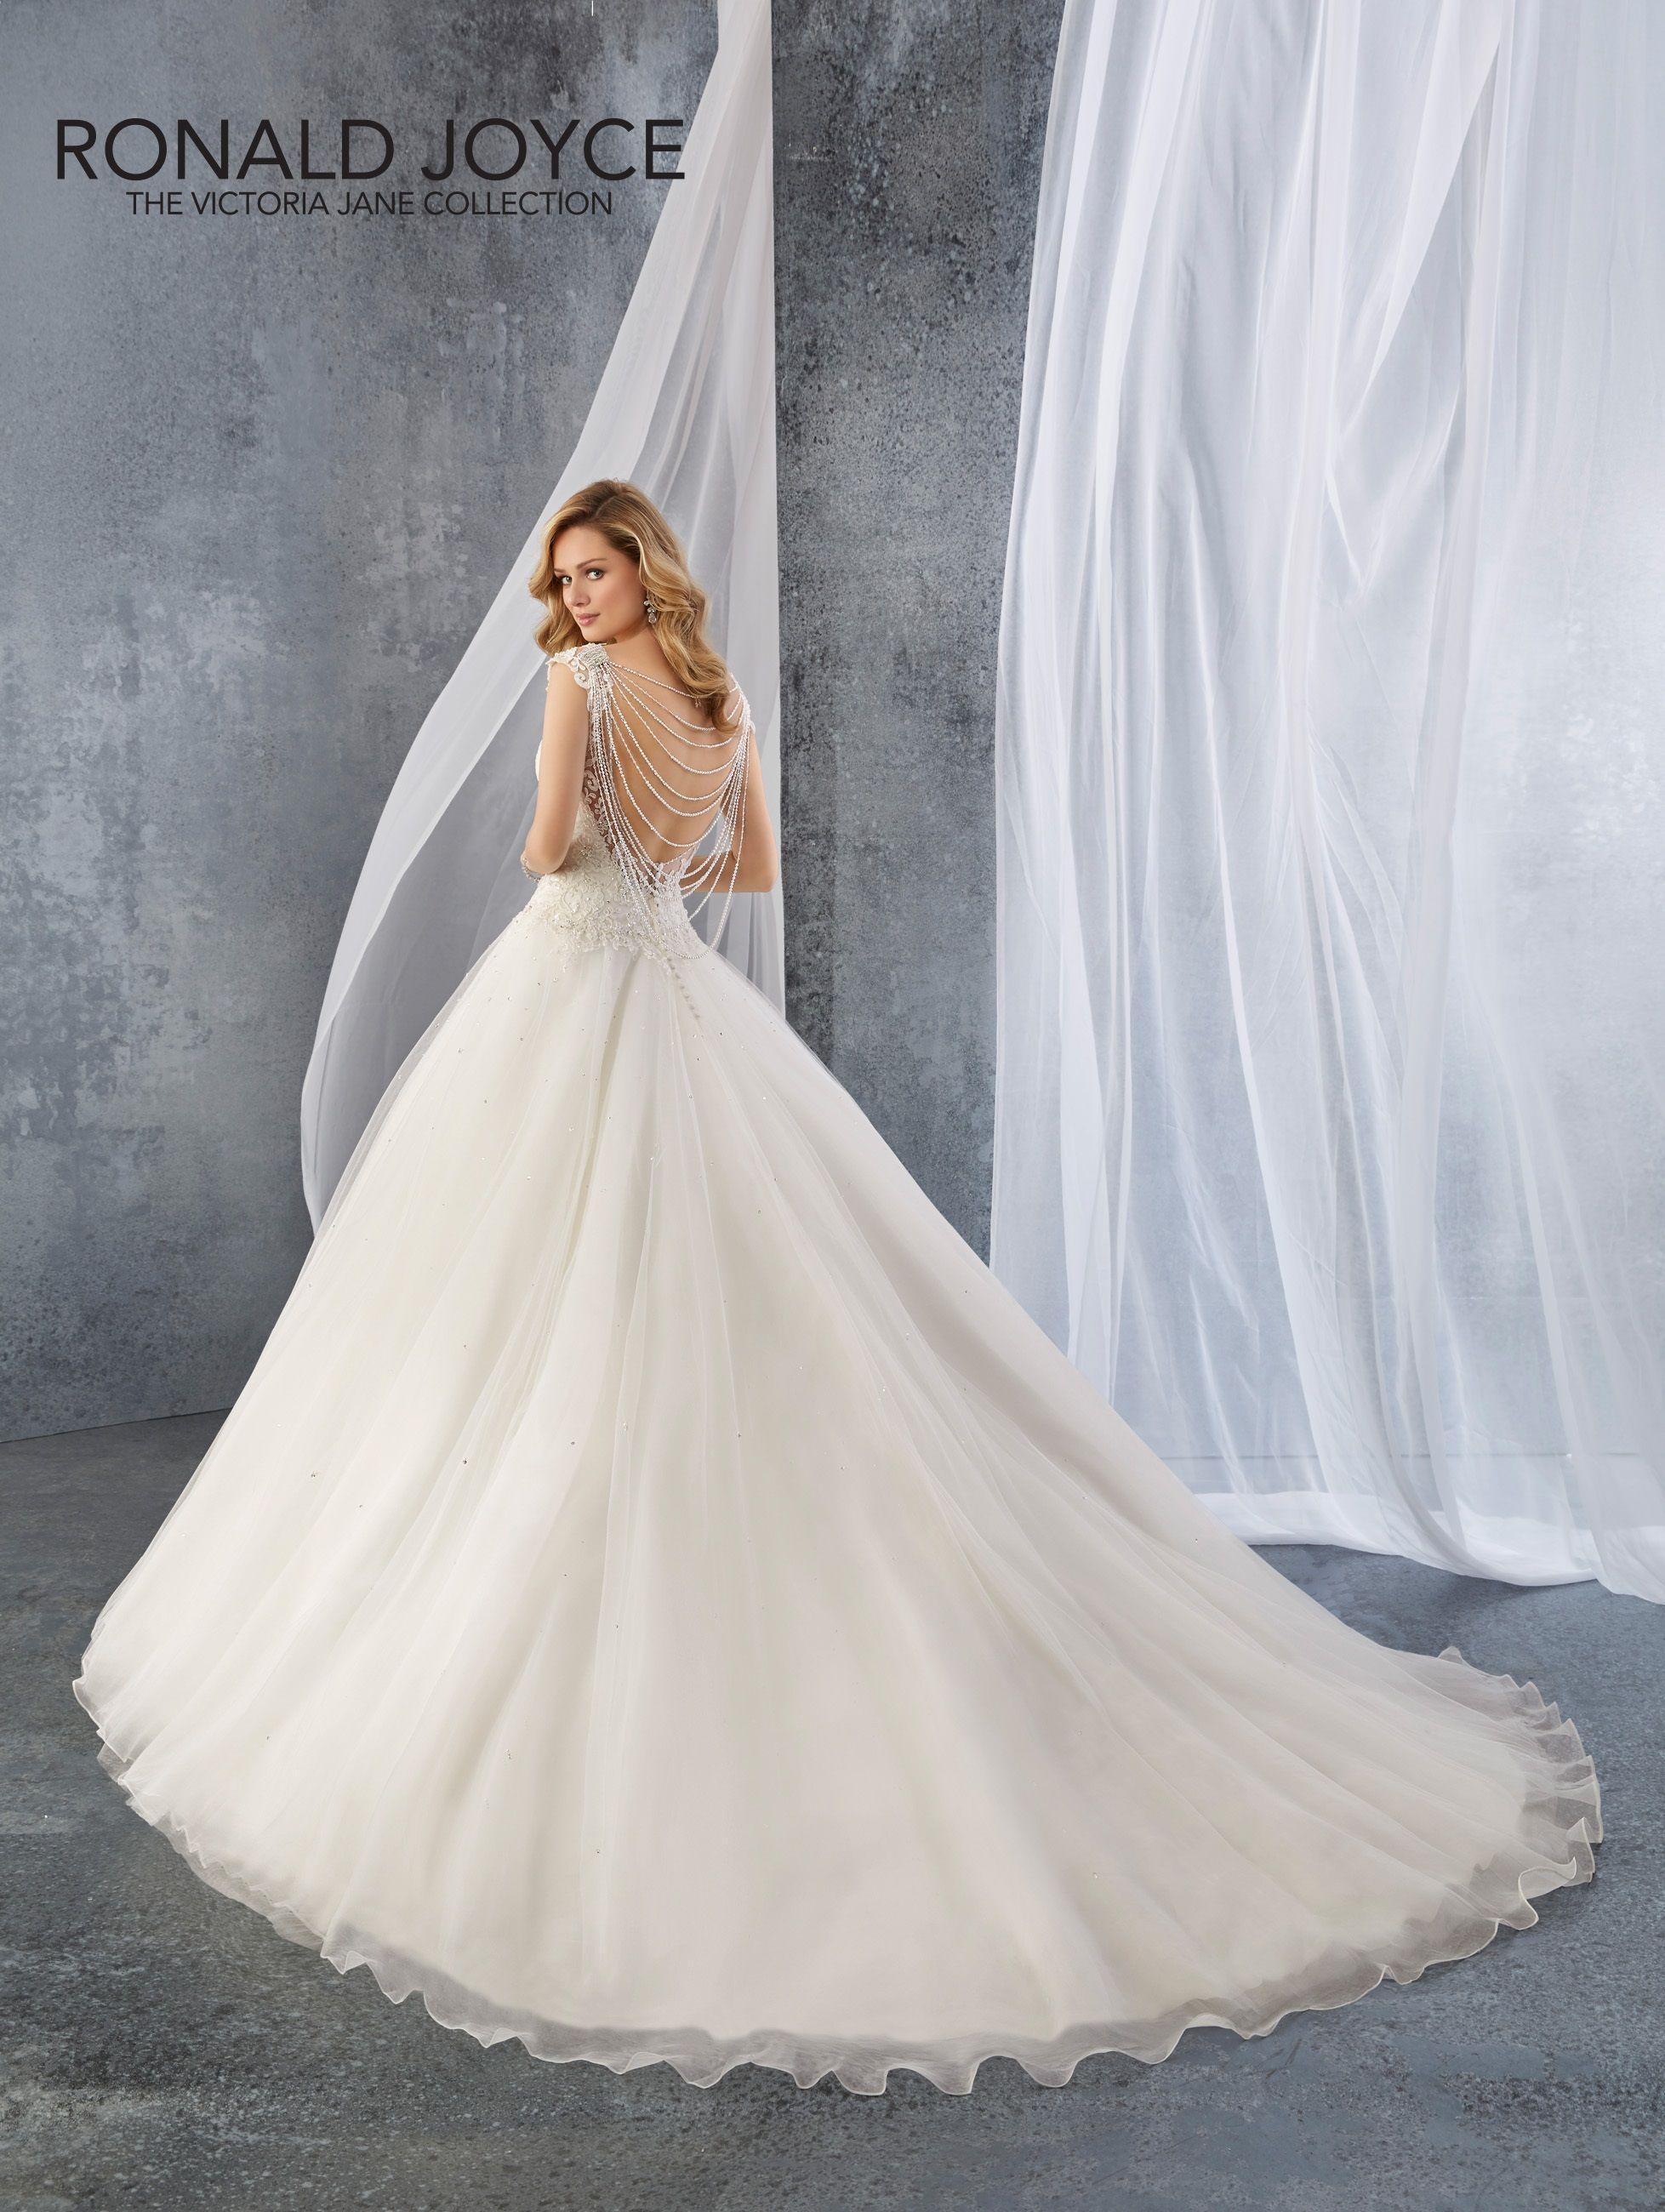 Jordan Wedding Dresses Ronald Joyce Wedding Dresses Elegant Bridal Gown [ 2600 x 1957 Pixel ]